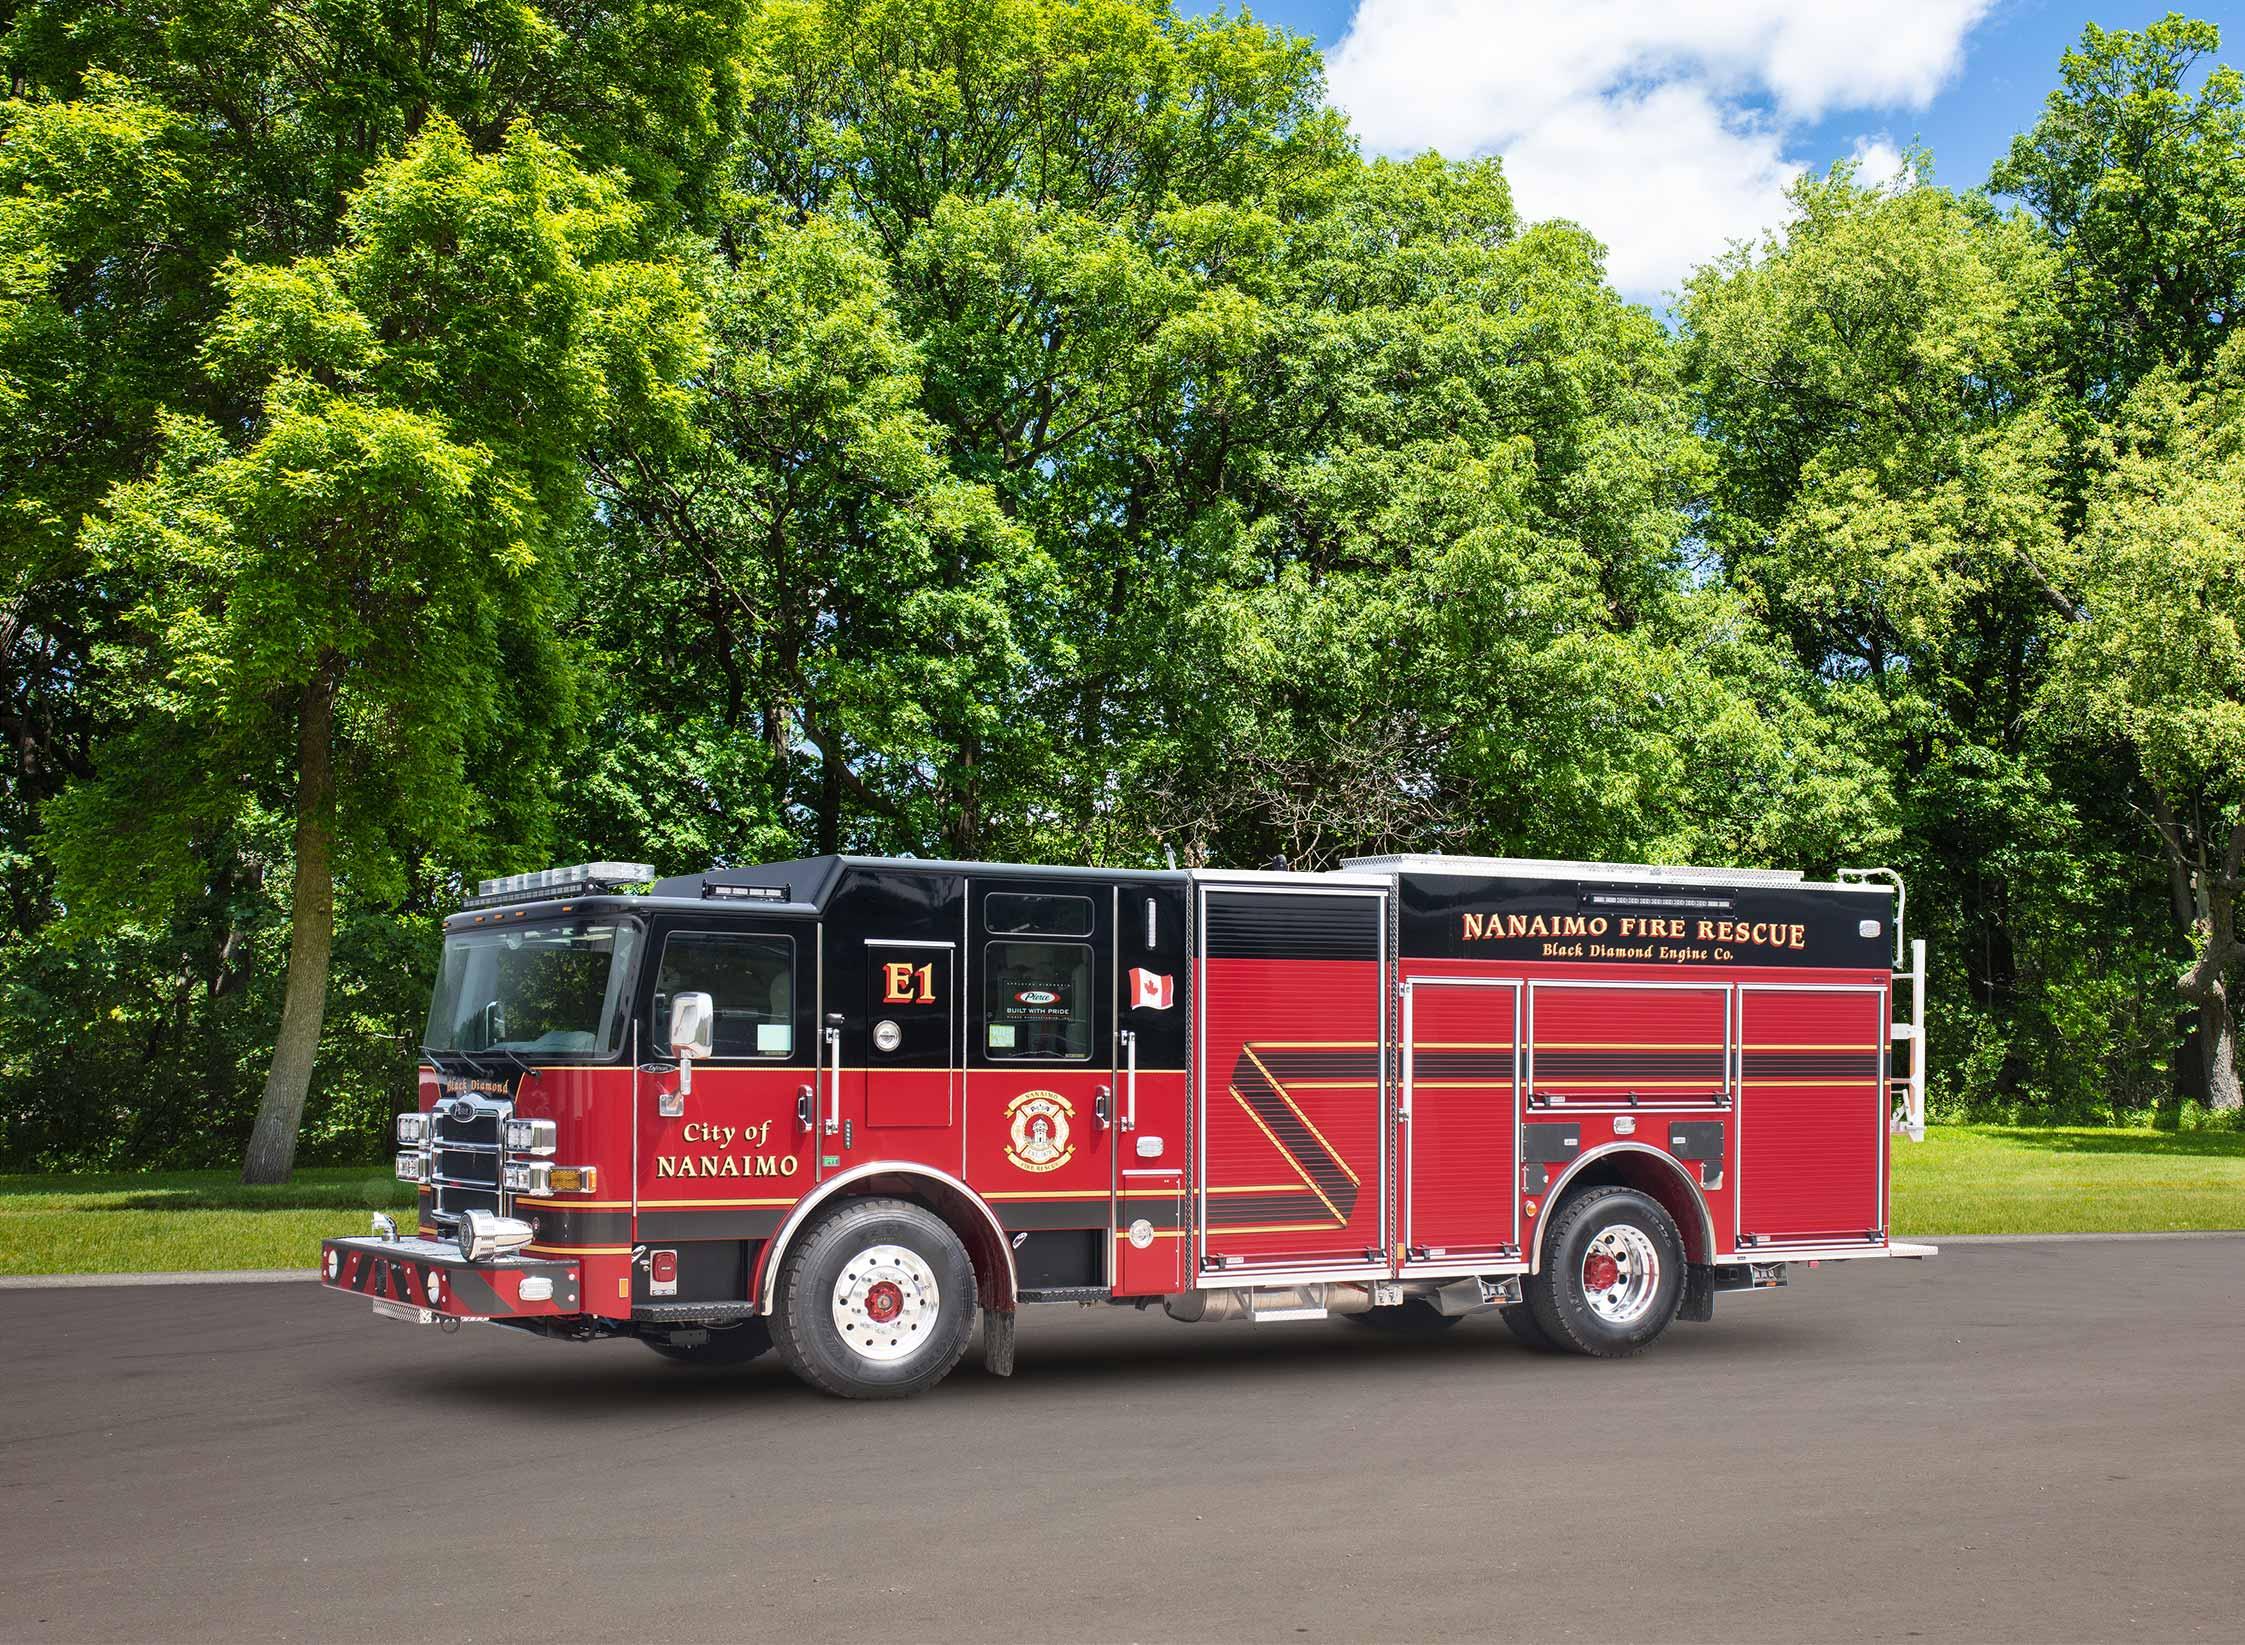 Nanaimo Fire Department - Pumper